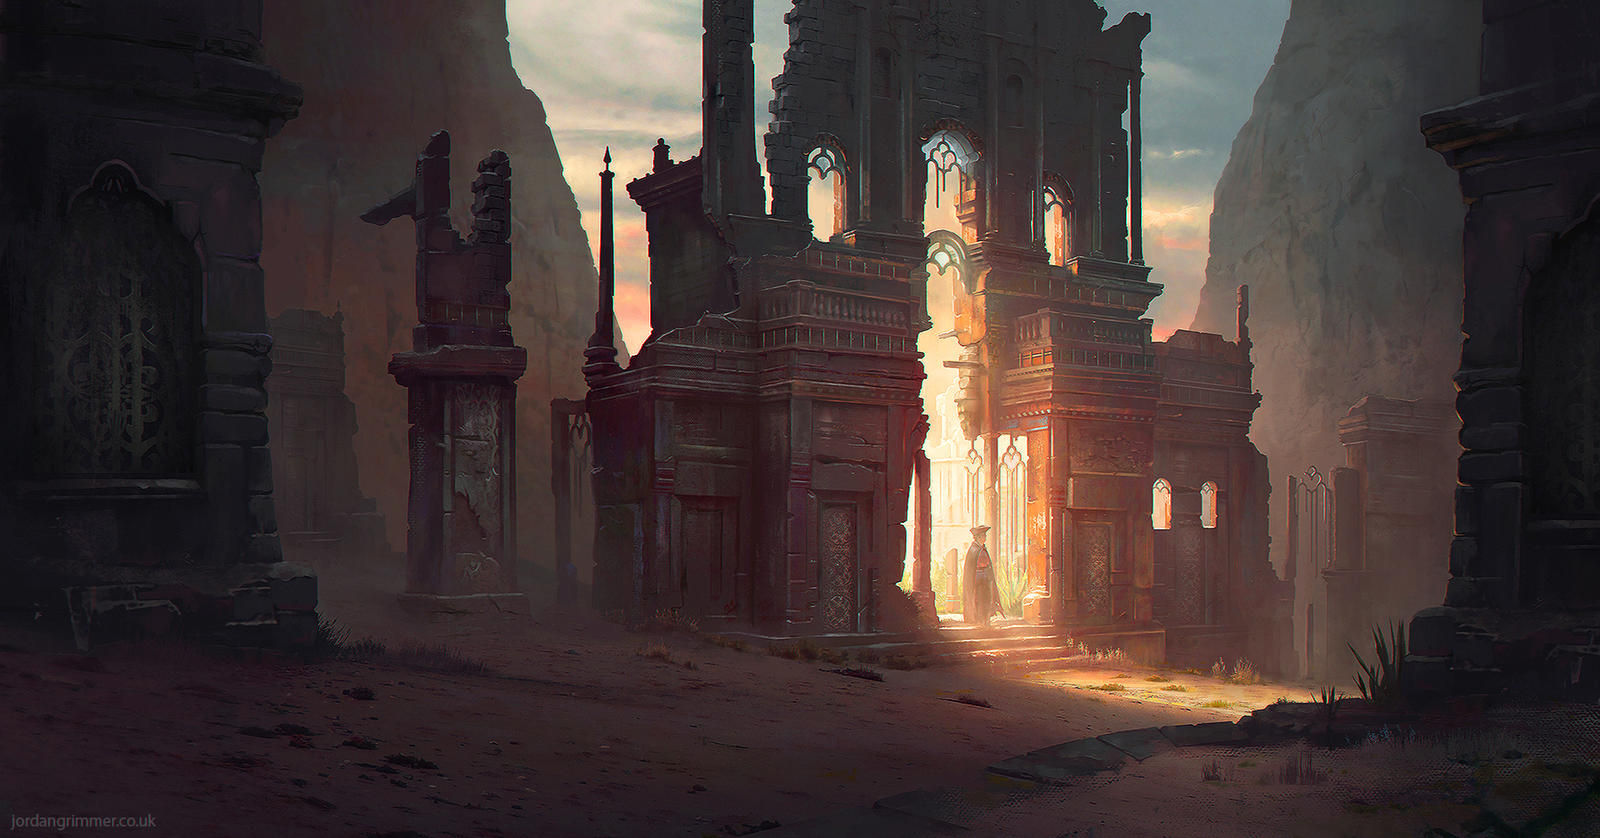 Broken Gate by jordangrimmer